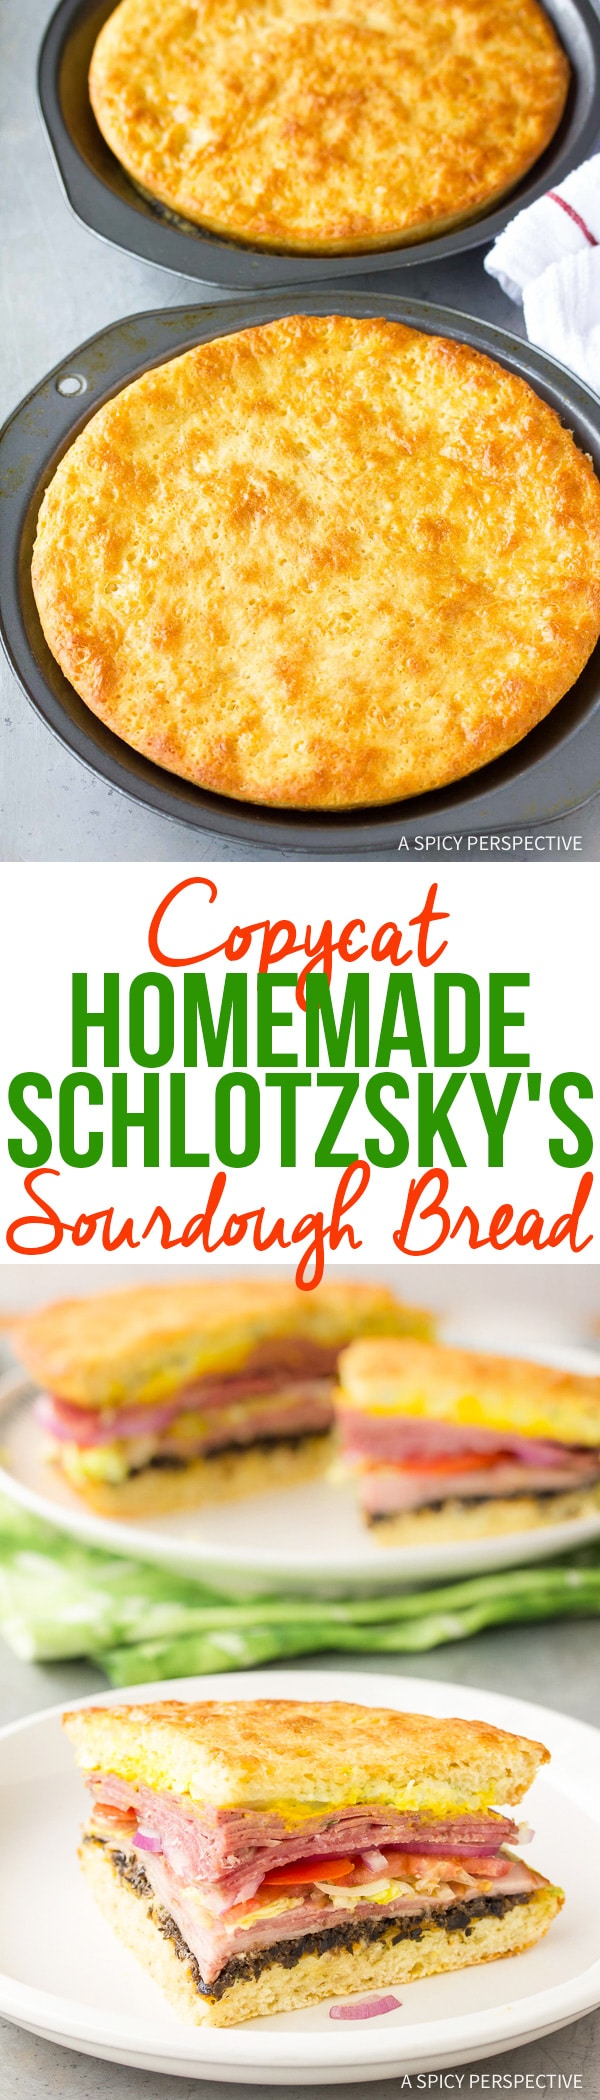 Copycat Homemade Schlotzsky's Sourdough Bread Recipe and Original Sandwiches!